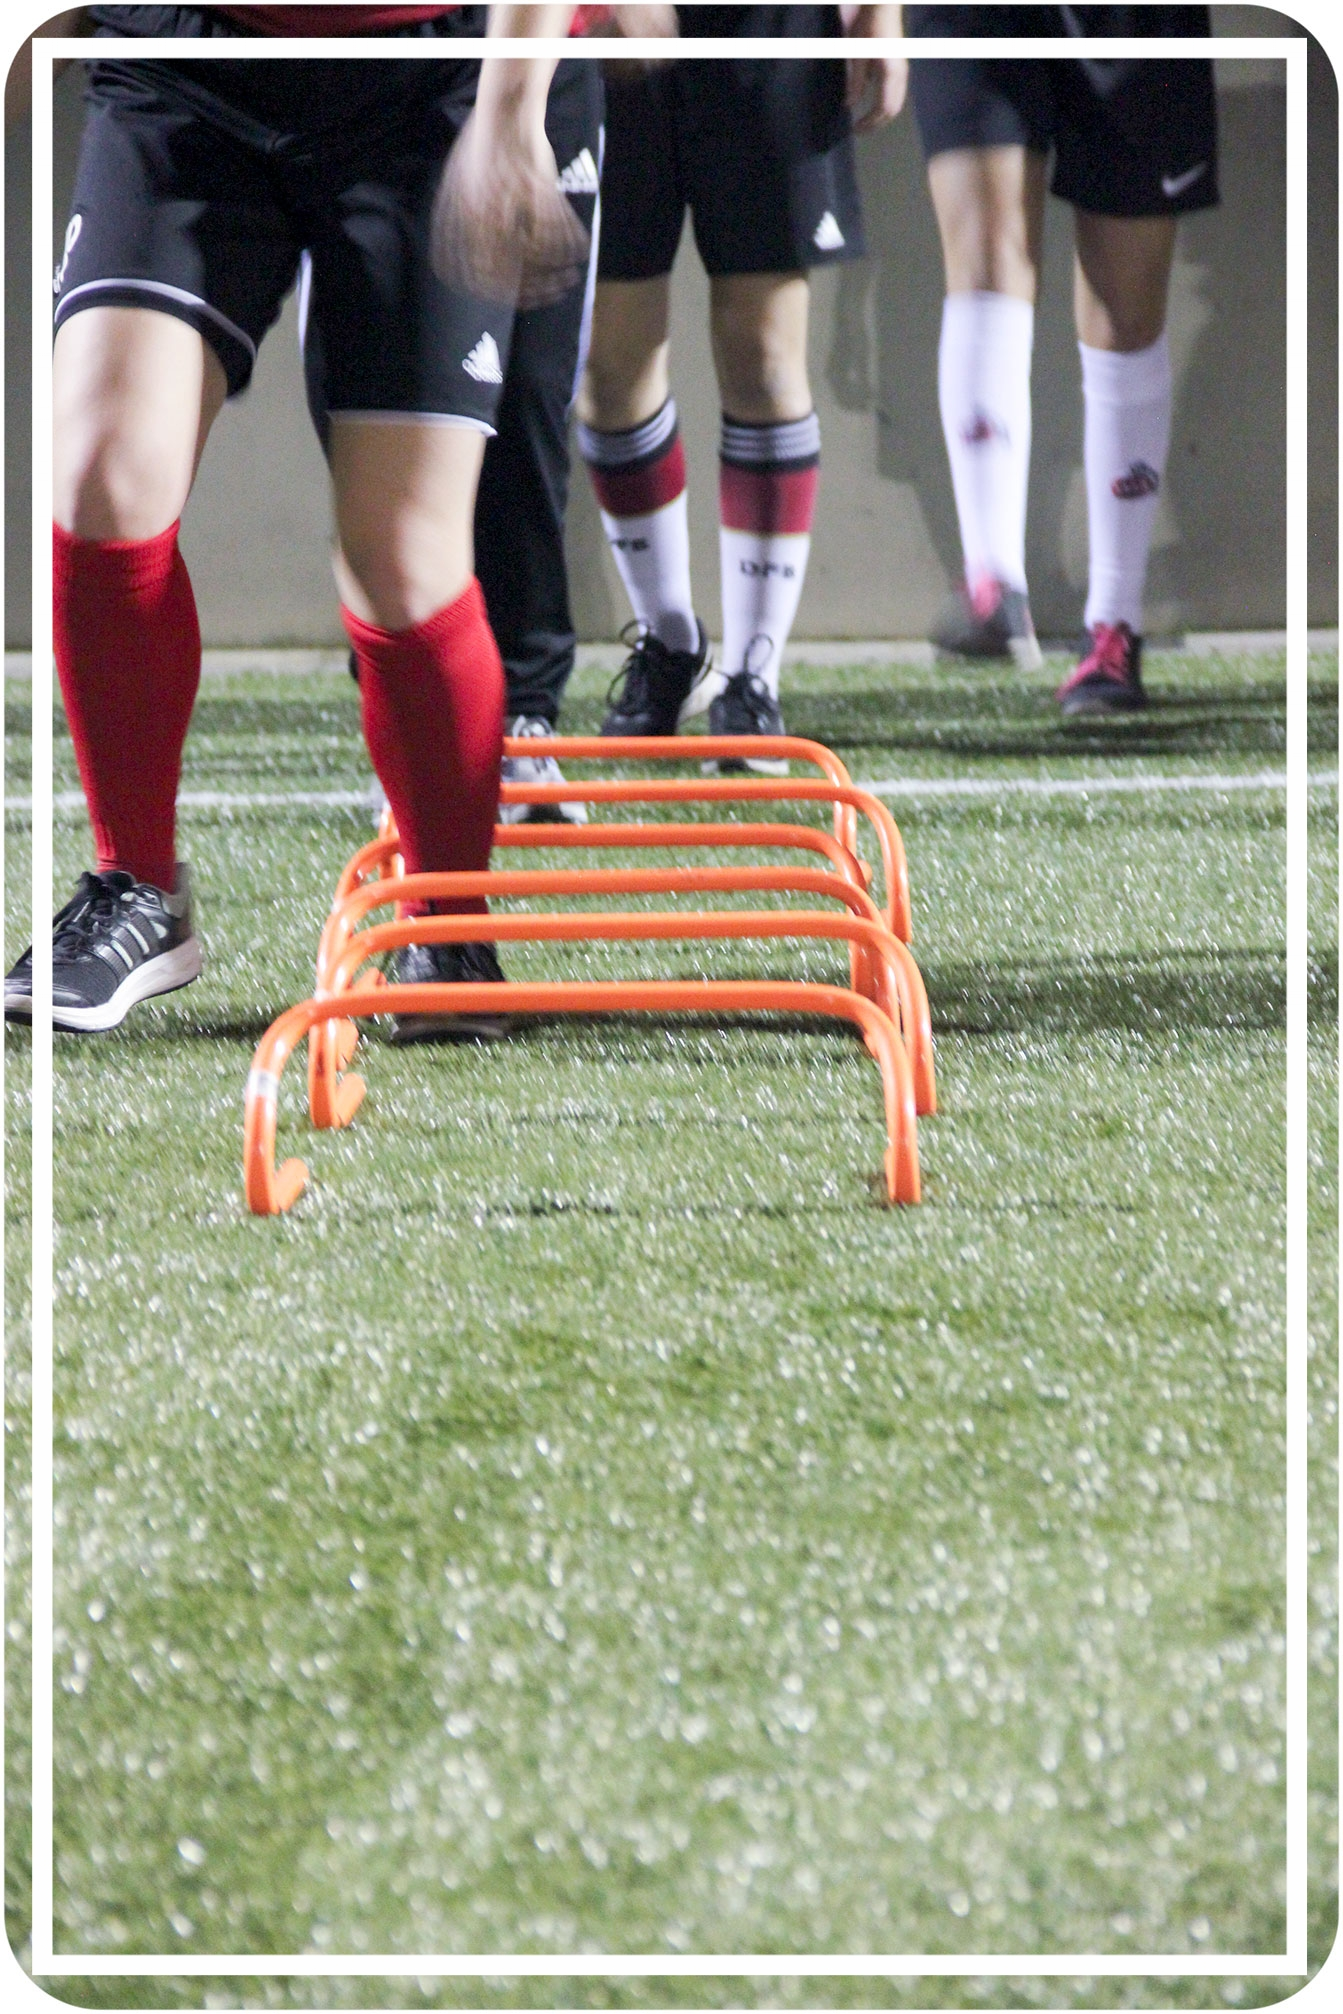 Athletiktraining u. a. mit Hürden -